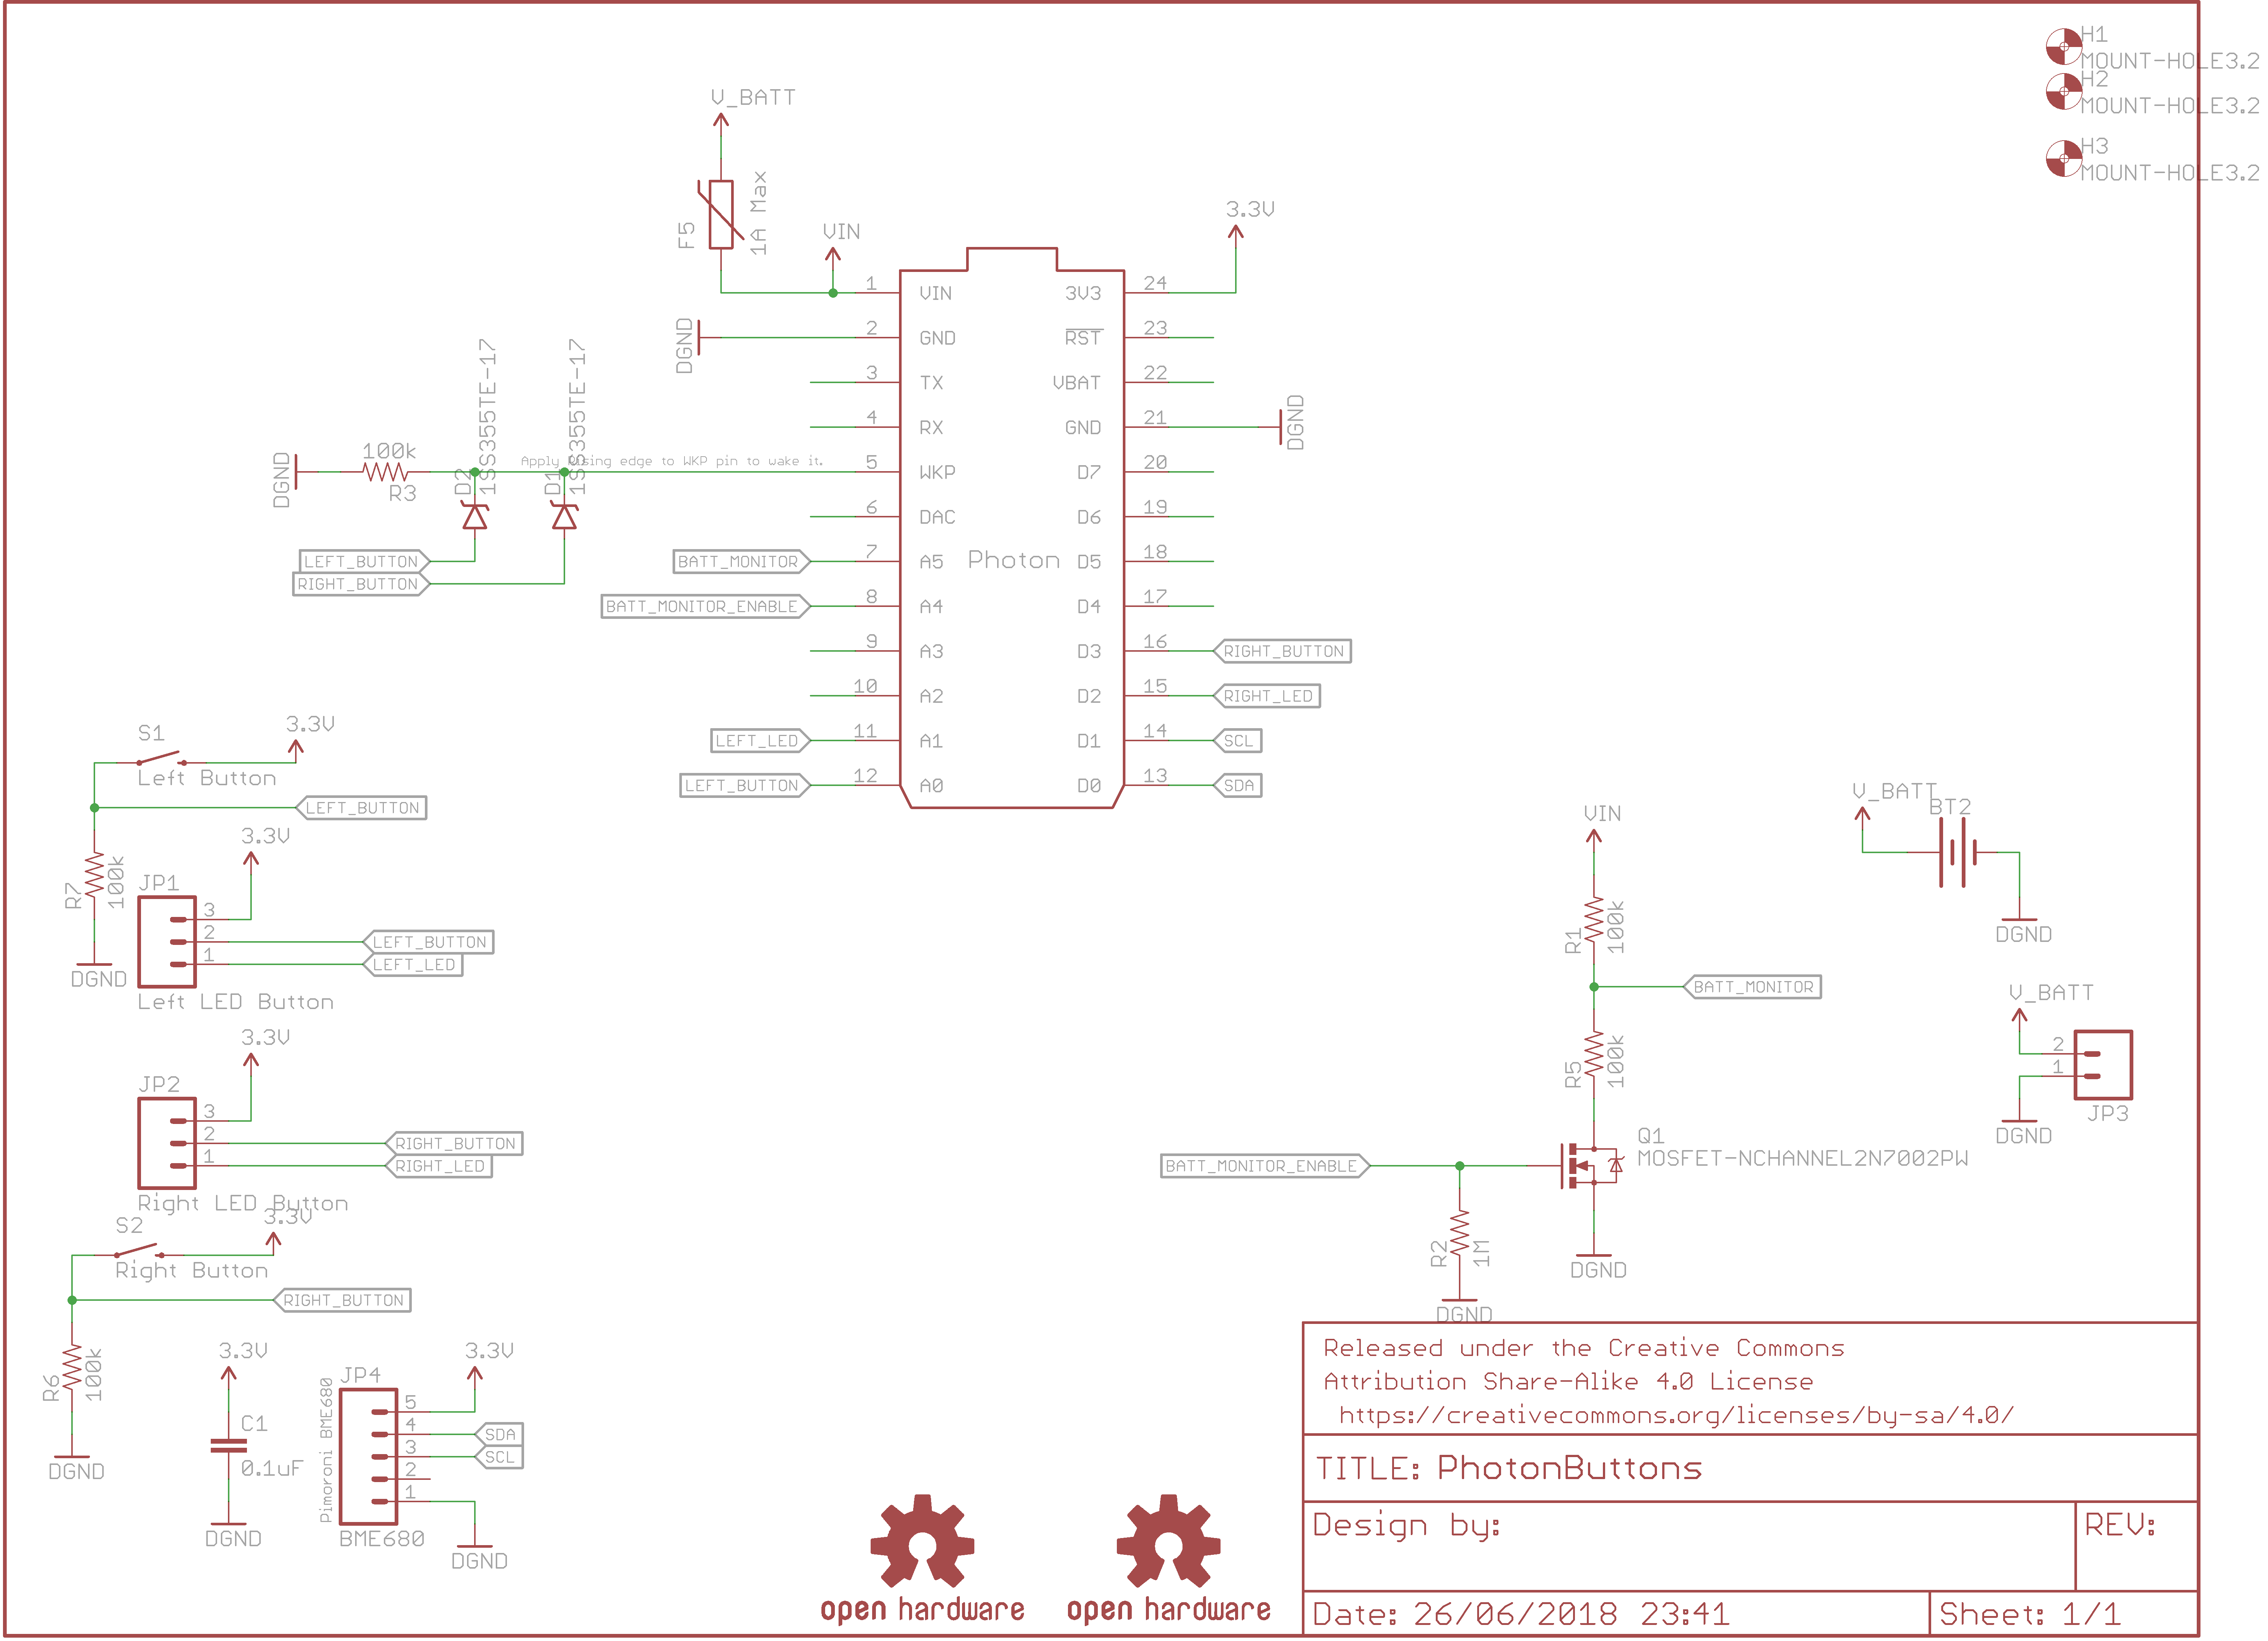 Schematic jrwkif7qj7